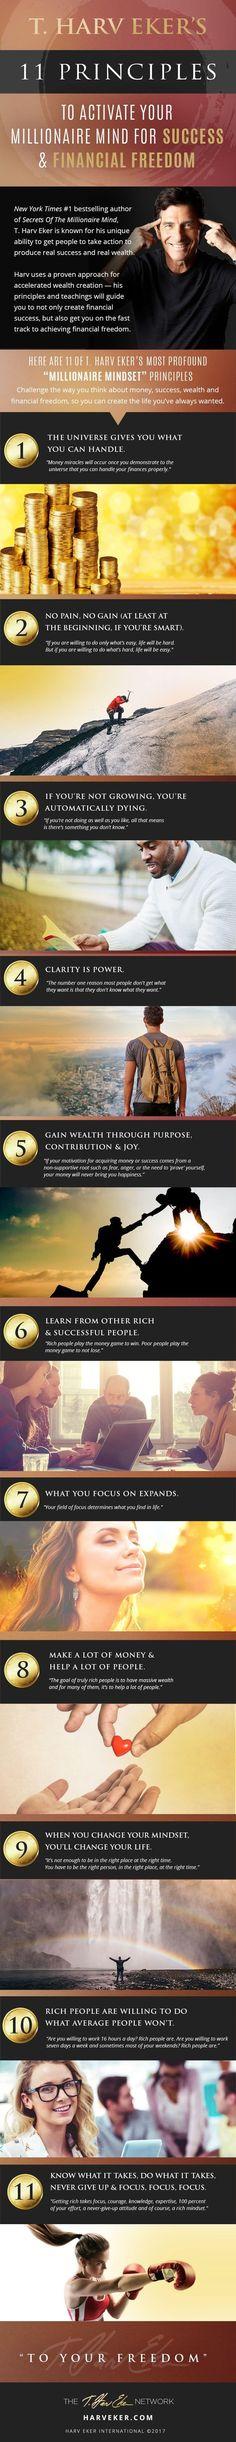 11-principles-success-harv-eker